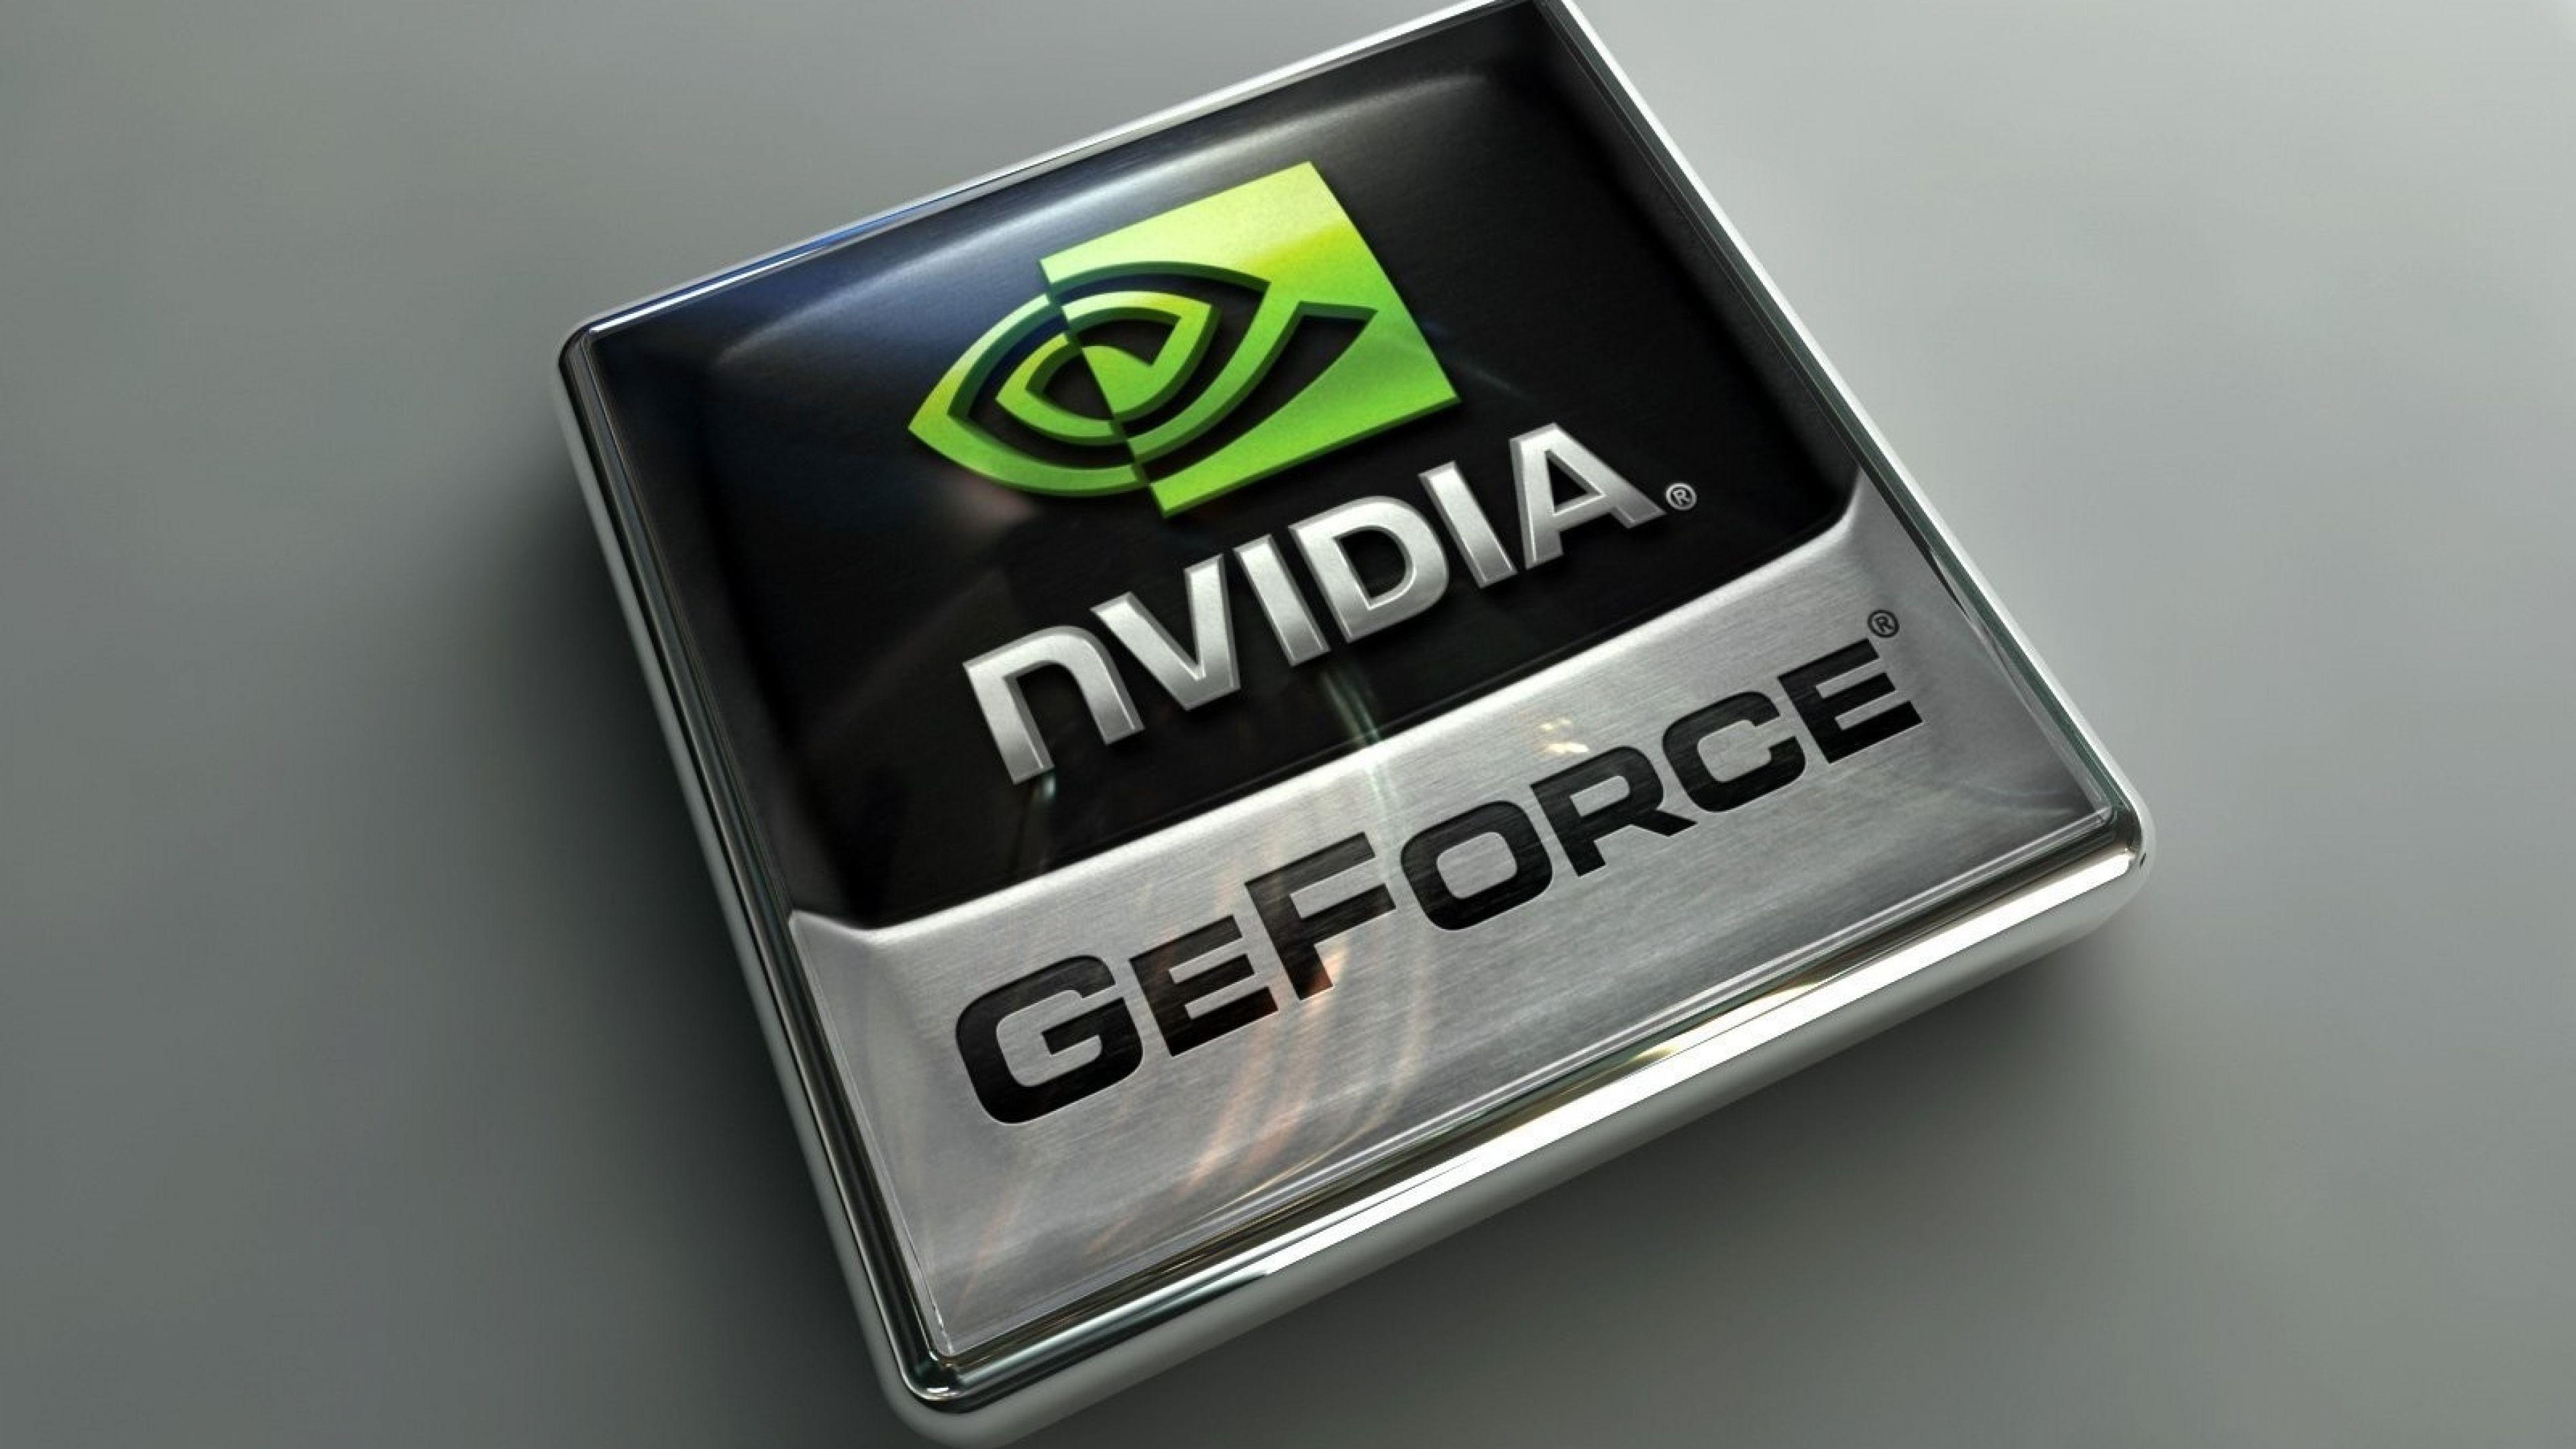 3840x2160 K Ultra Hd Nvidia Wallpapers Hd Desktop Backgrounds X Art Nvidia Graphic Card Hi Tech Wallpaper